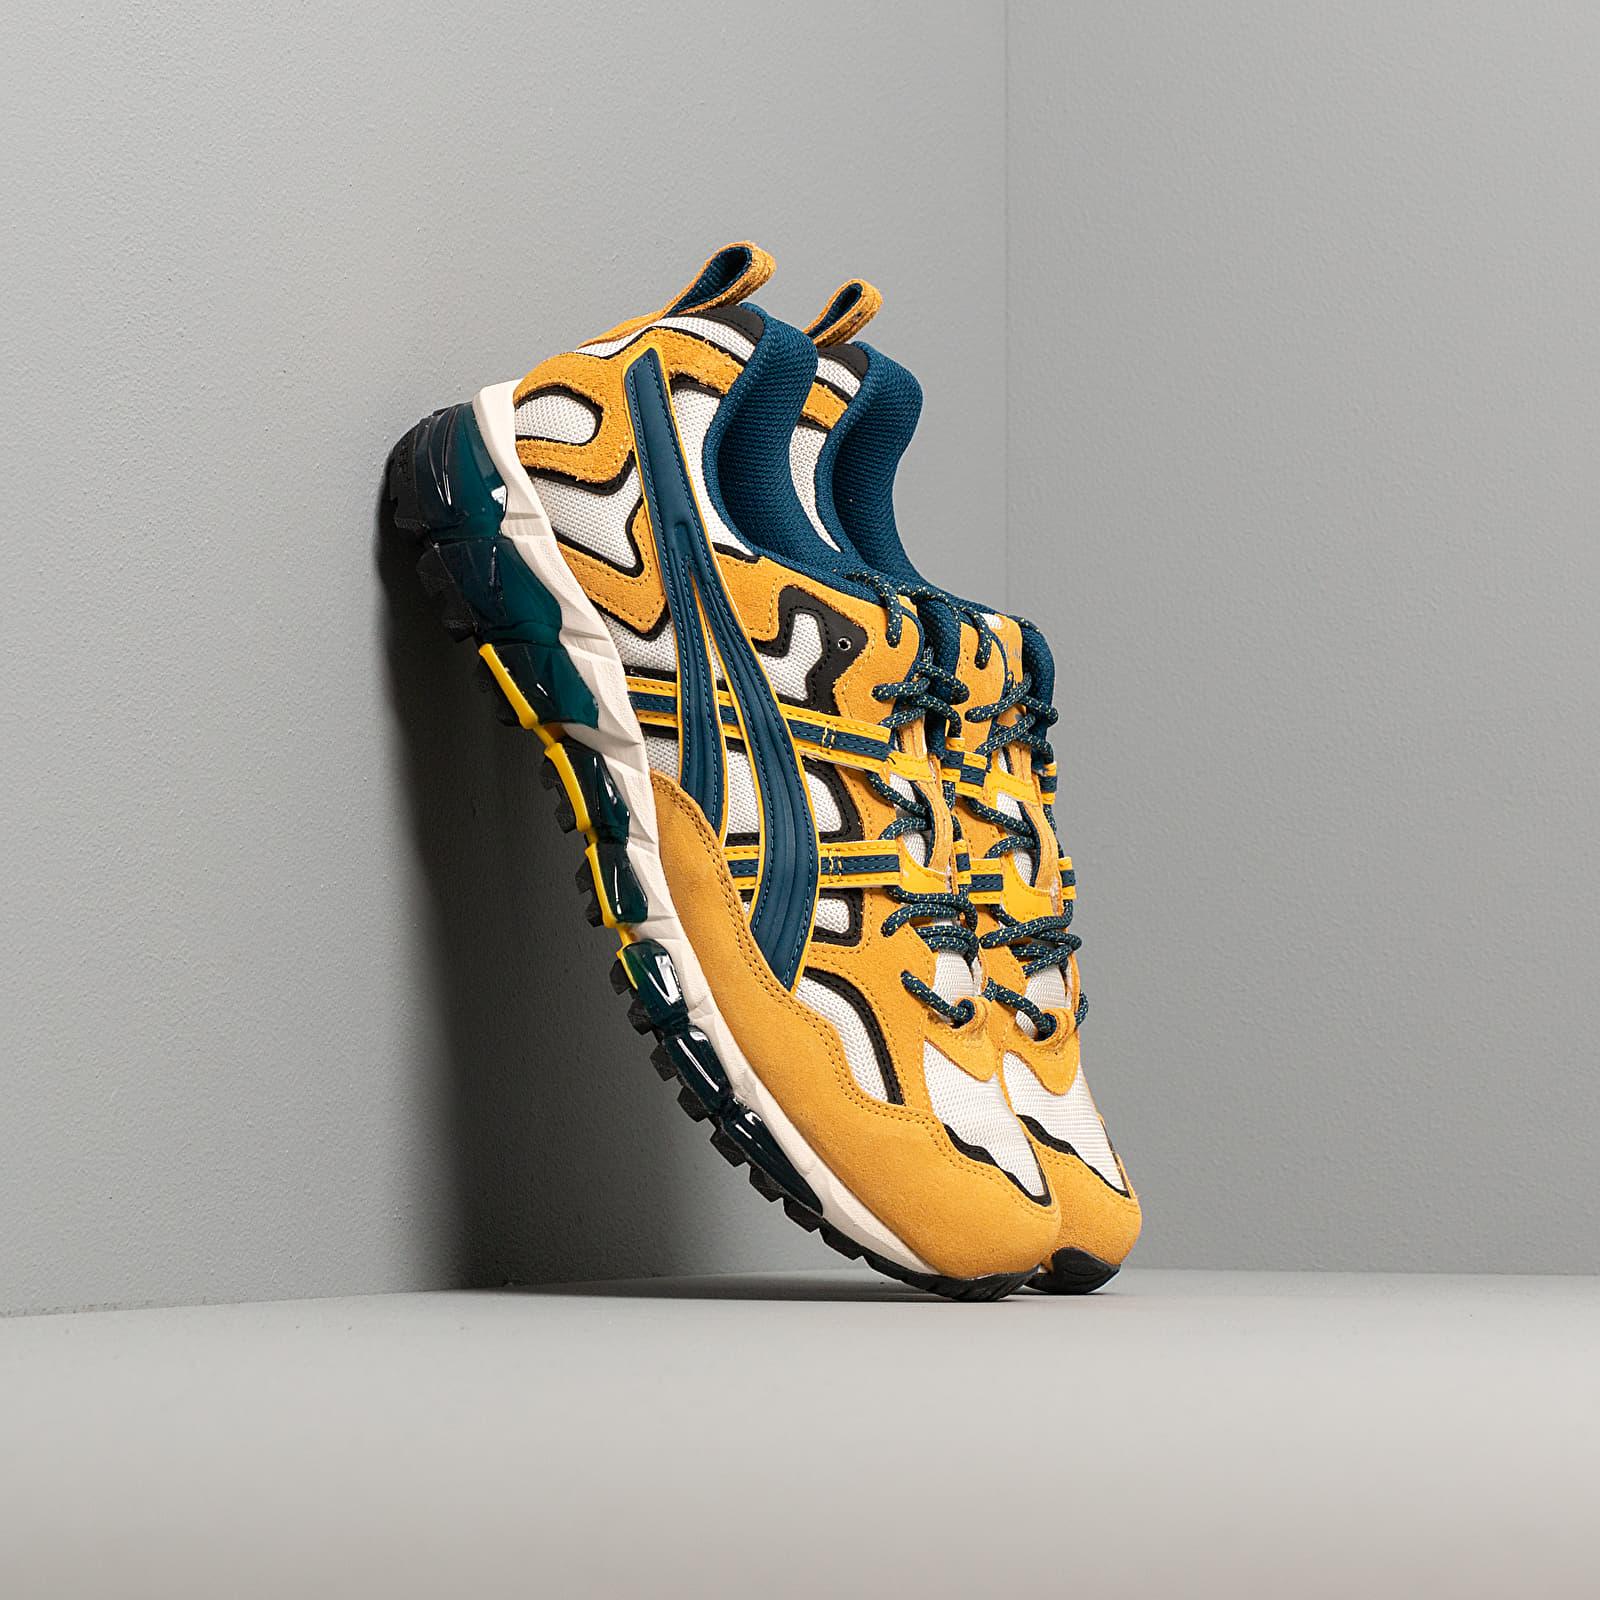 Men's shoes Asics GEL-NANDI 360 Cream/ Mako Blue